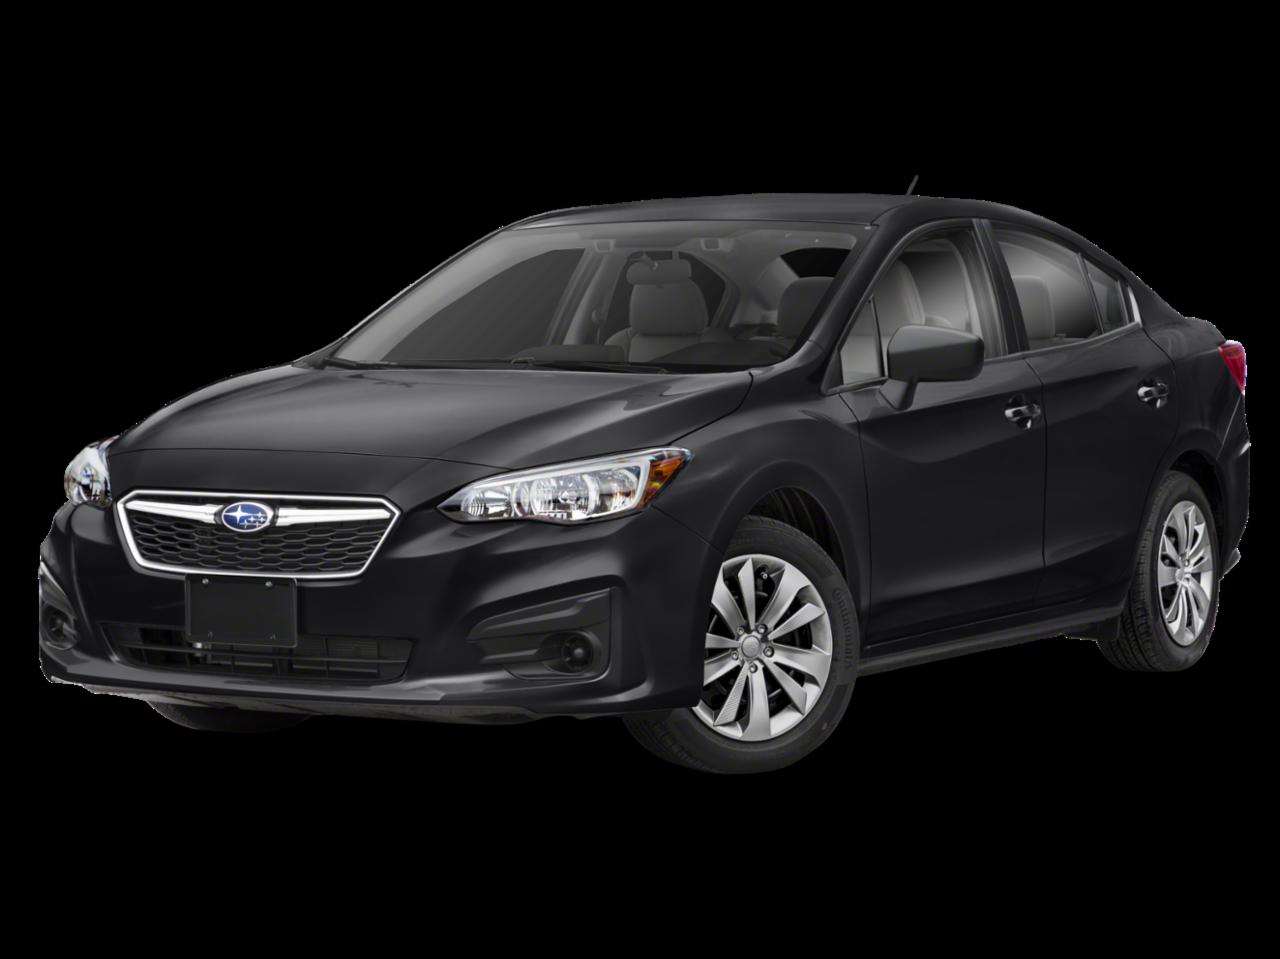 2019 Subaru Impreza 2.0i 4dr Car